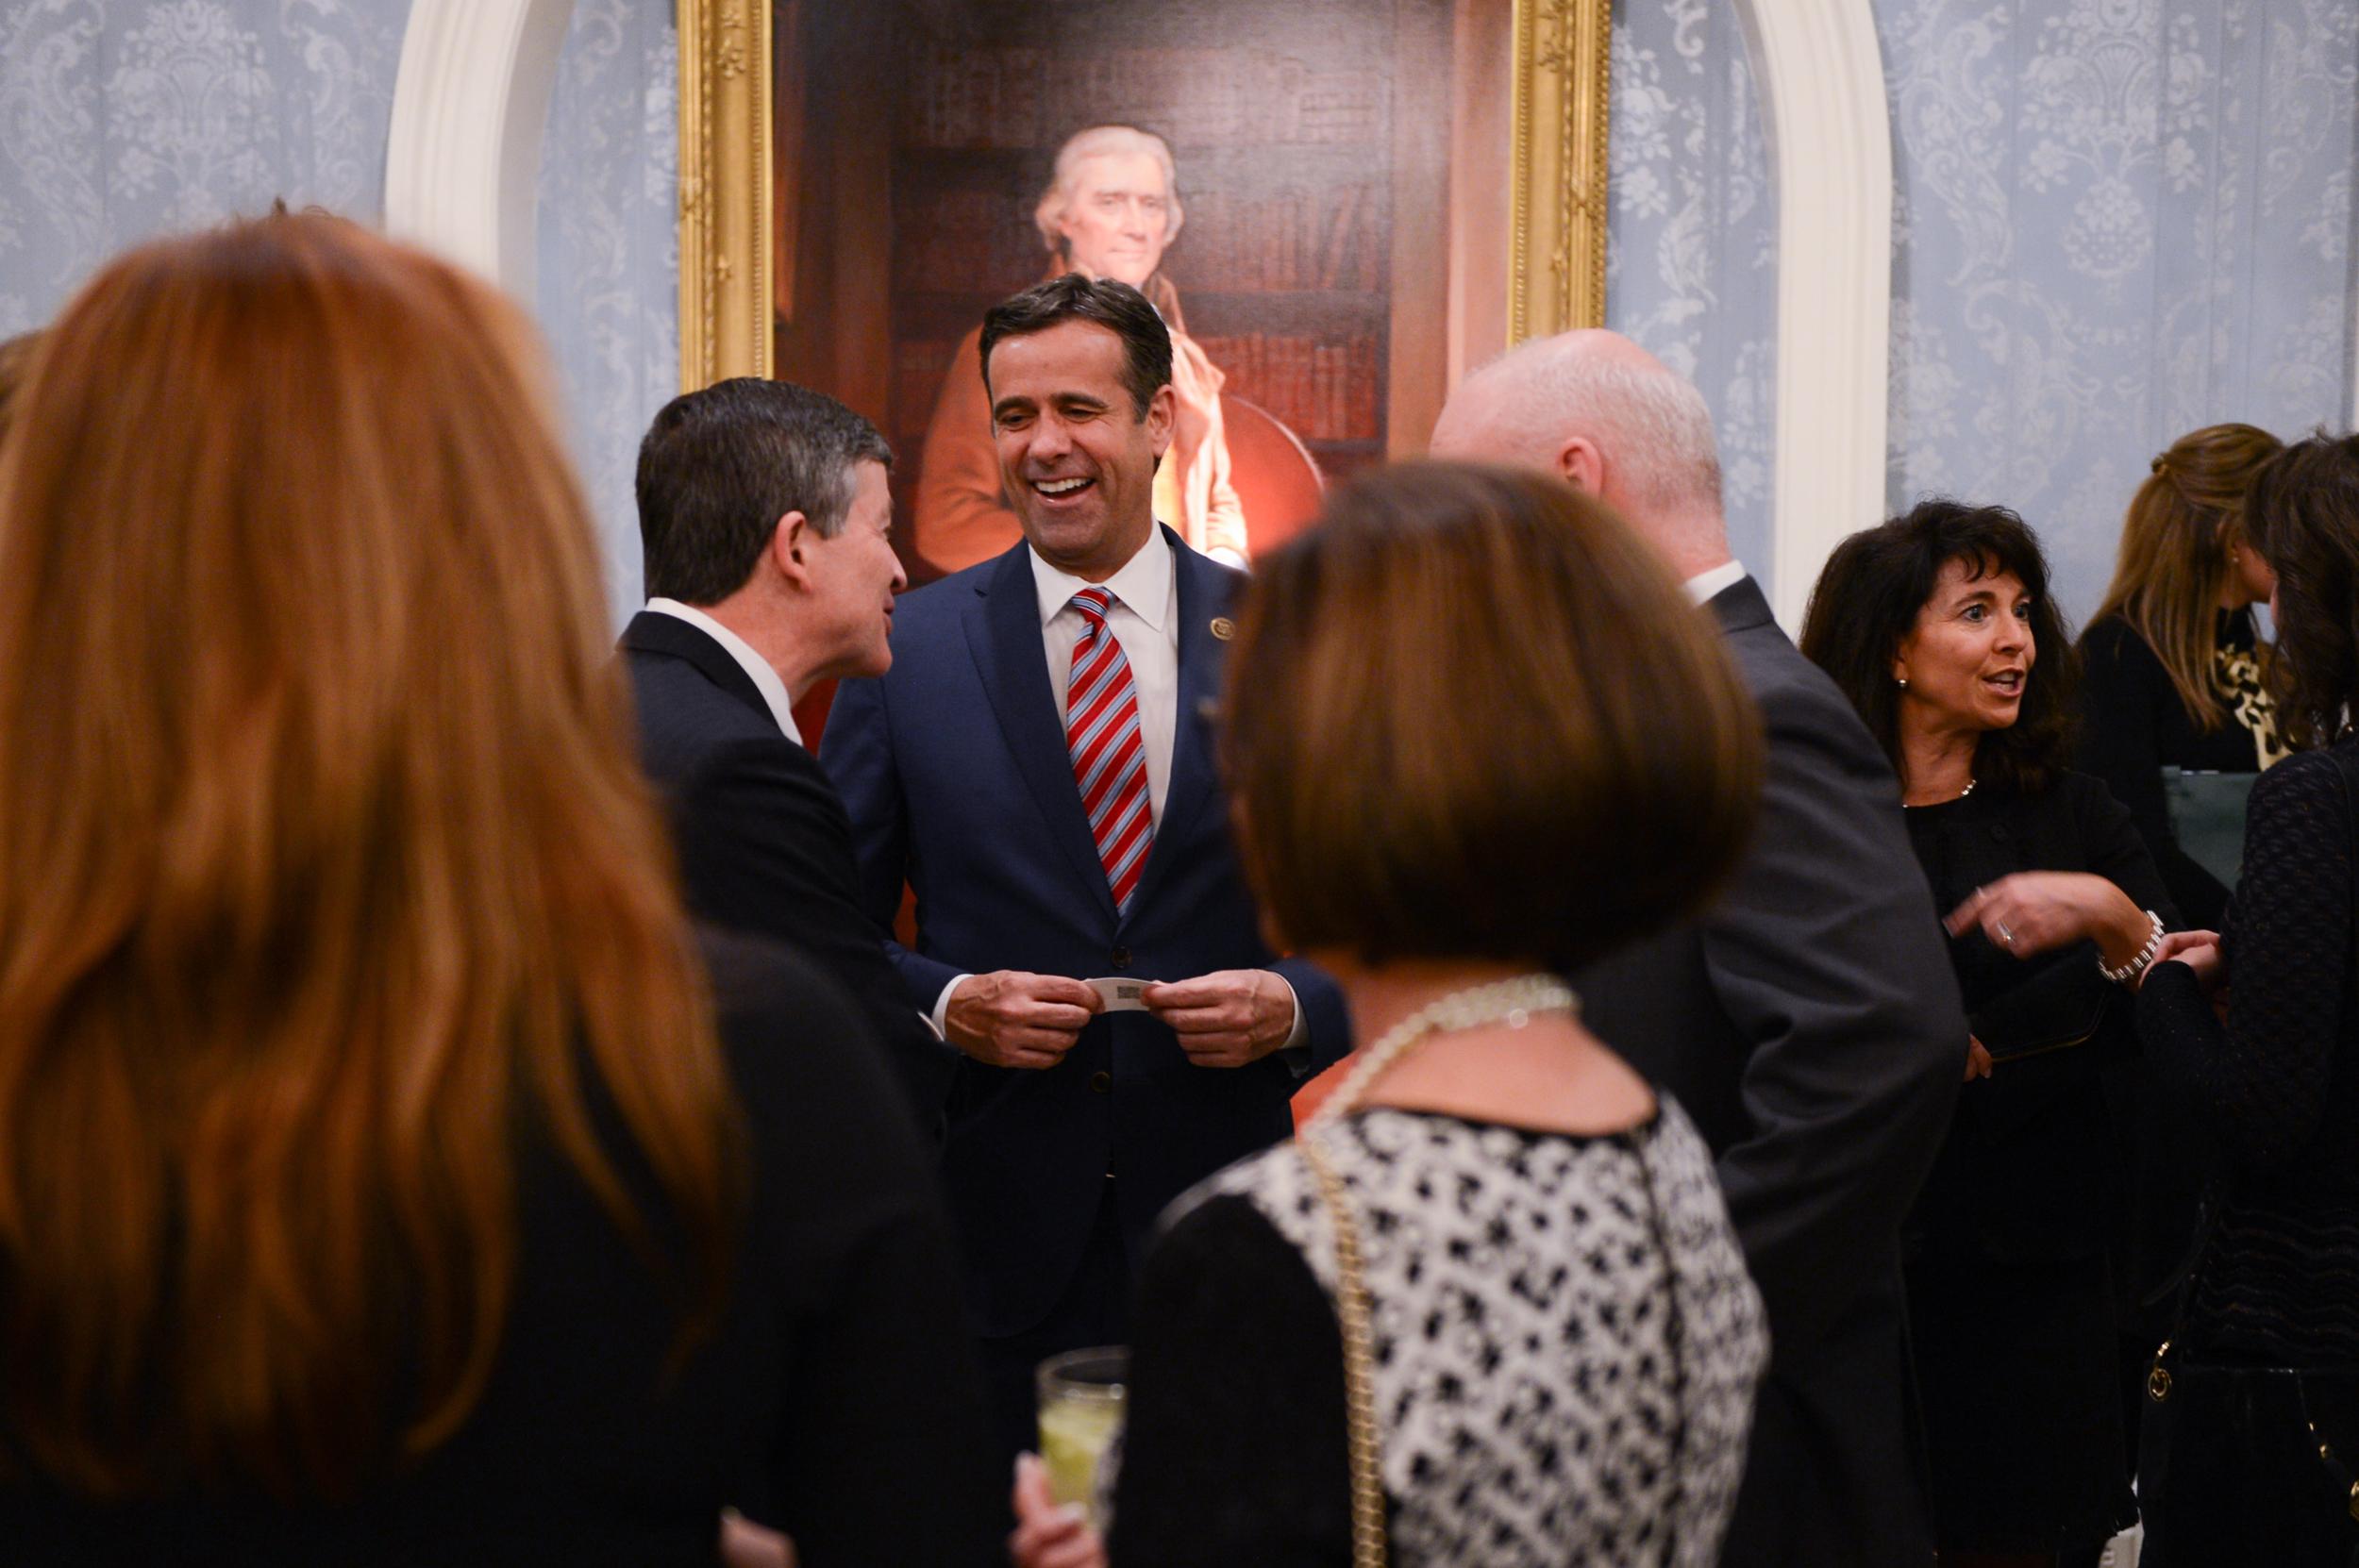 Congressman John Ratcliffe (TX-4) at the Team Ryan North Texas Dinner at Old Parkland in 2016.